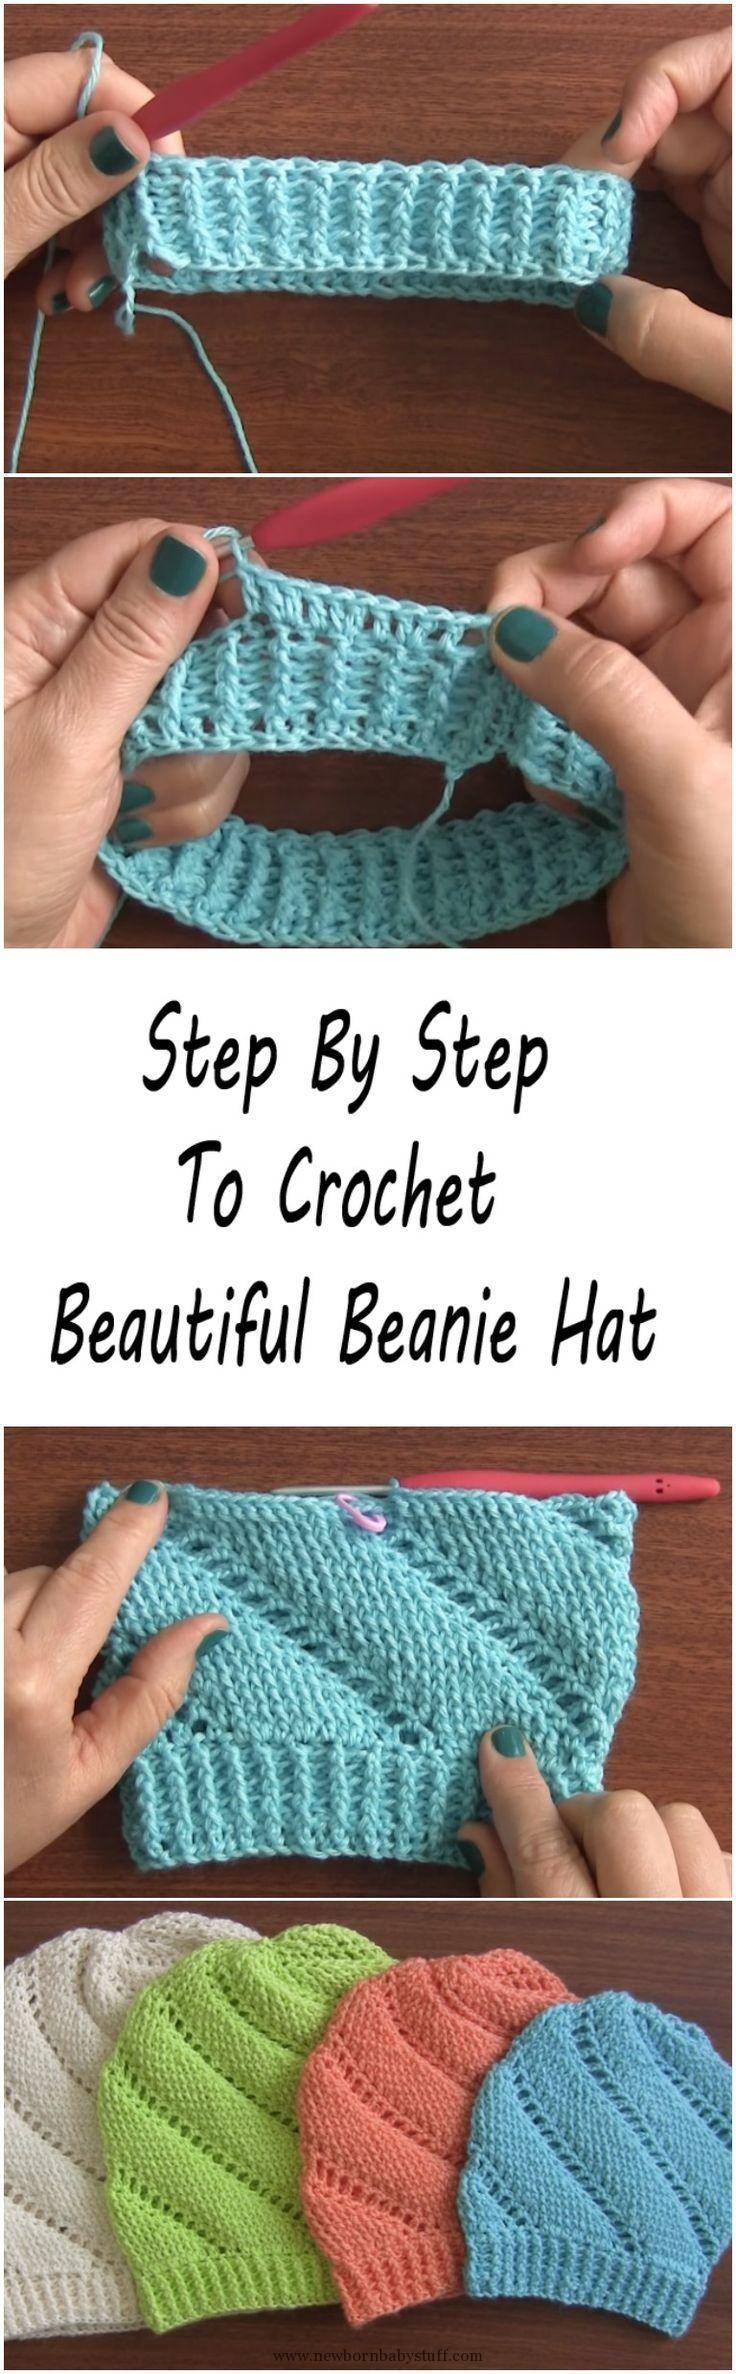 Baby Knitting Patterns Beautiful Beanie Hat...